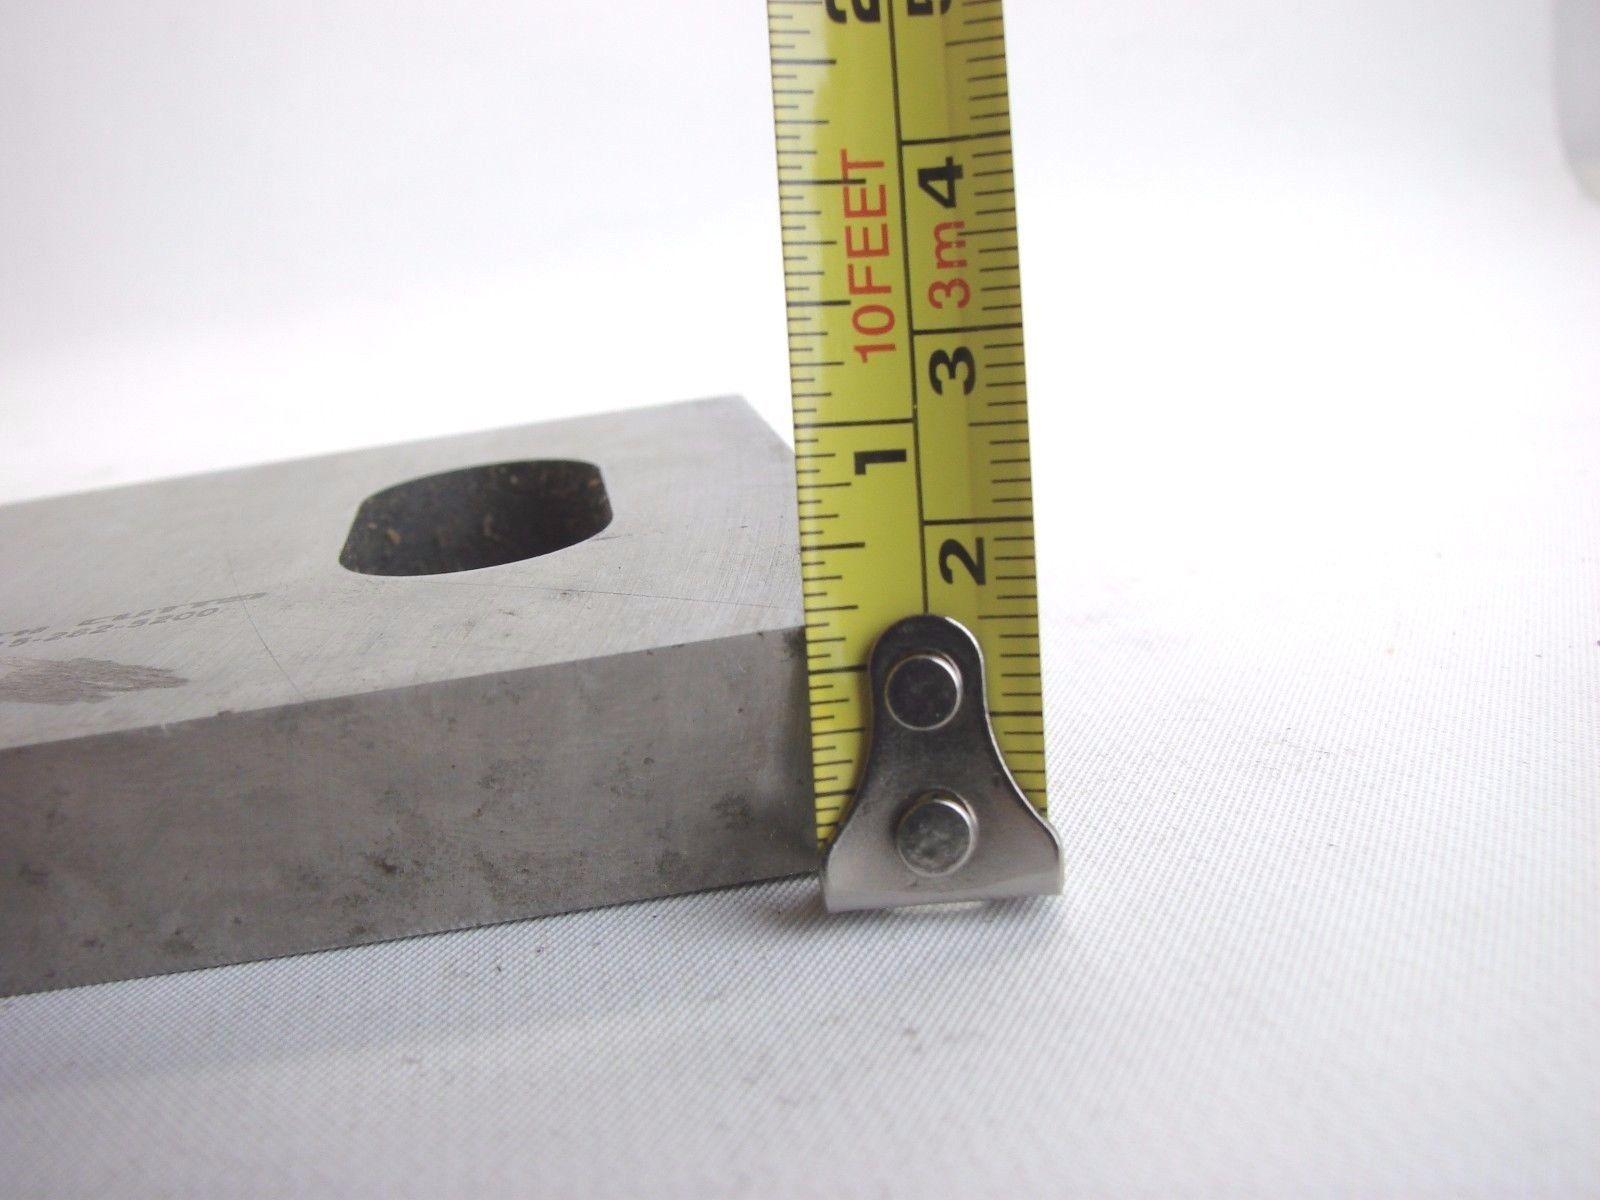 "3 Zenith Cutter Granulator Knives Chompers 540936 14-3/4 x 3"" X 1/2"" 5-Hole b377"